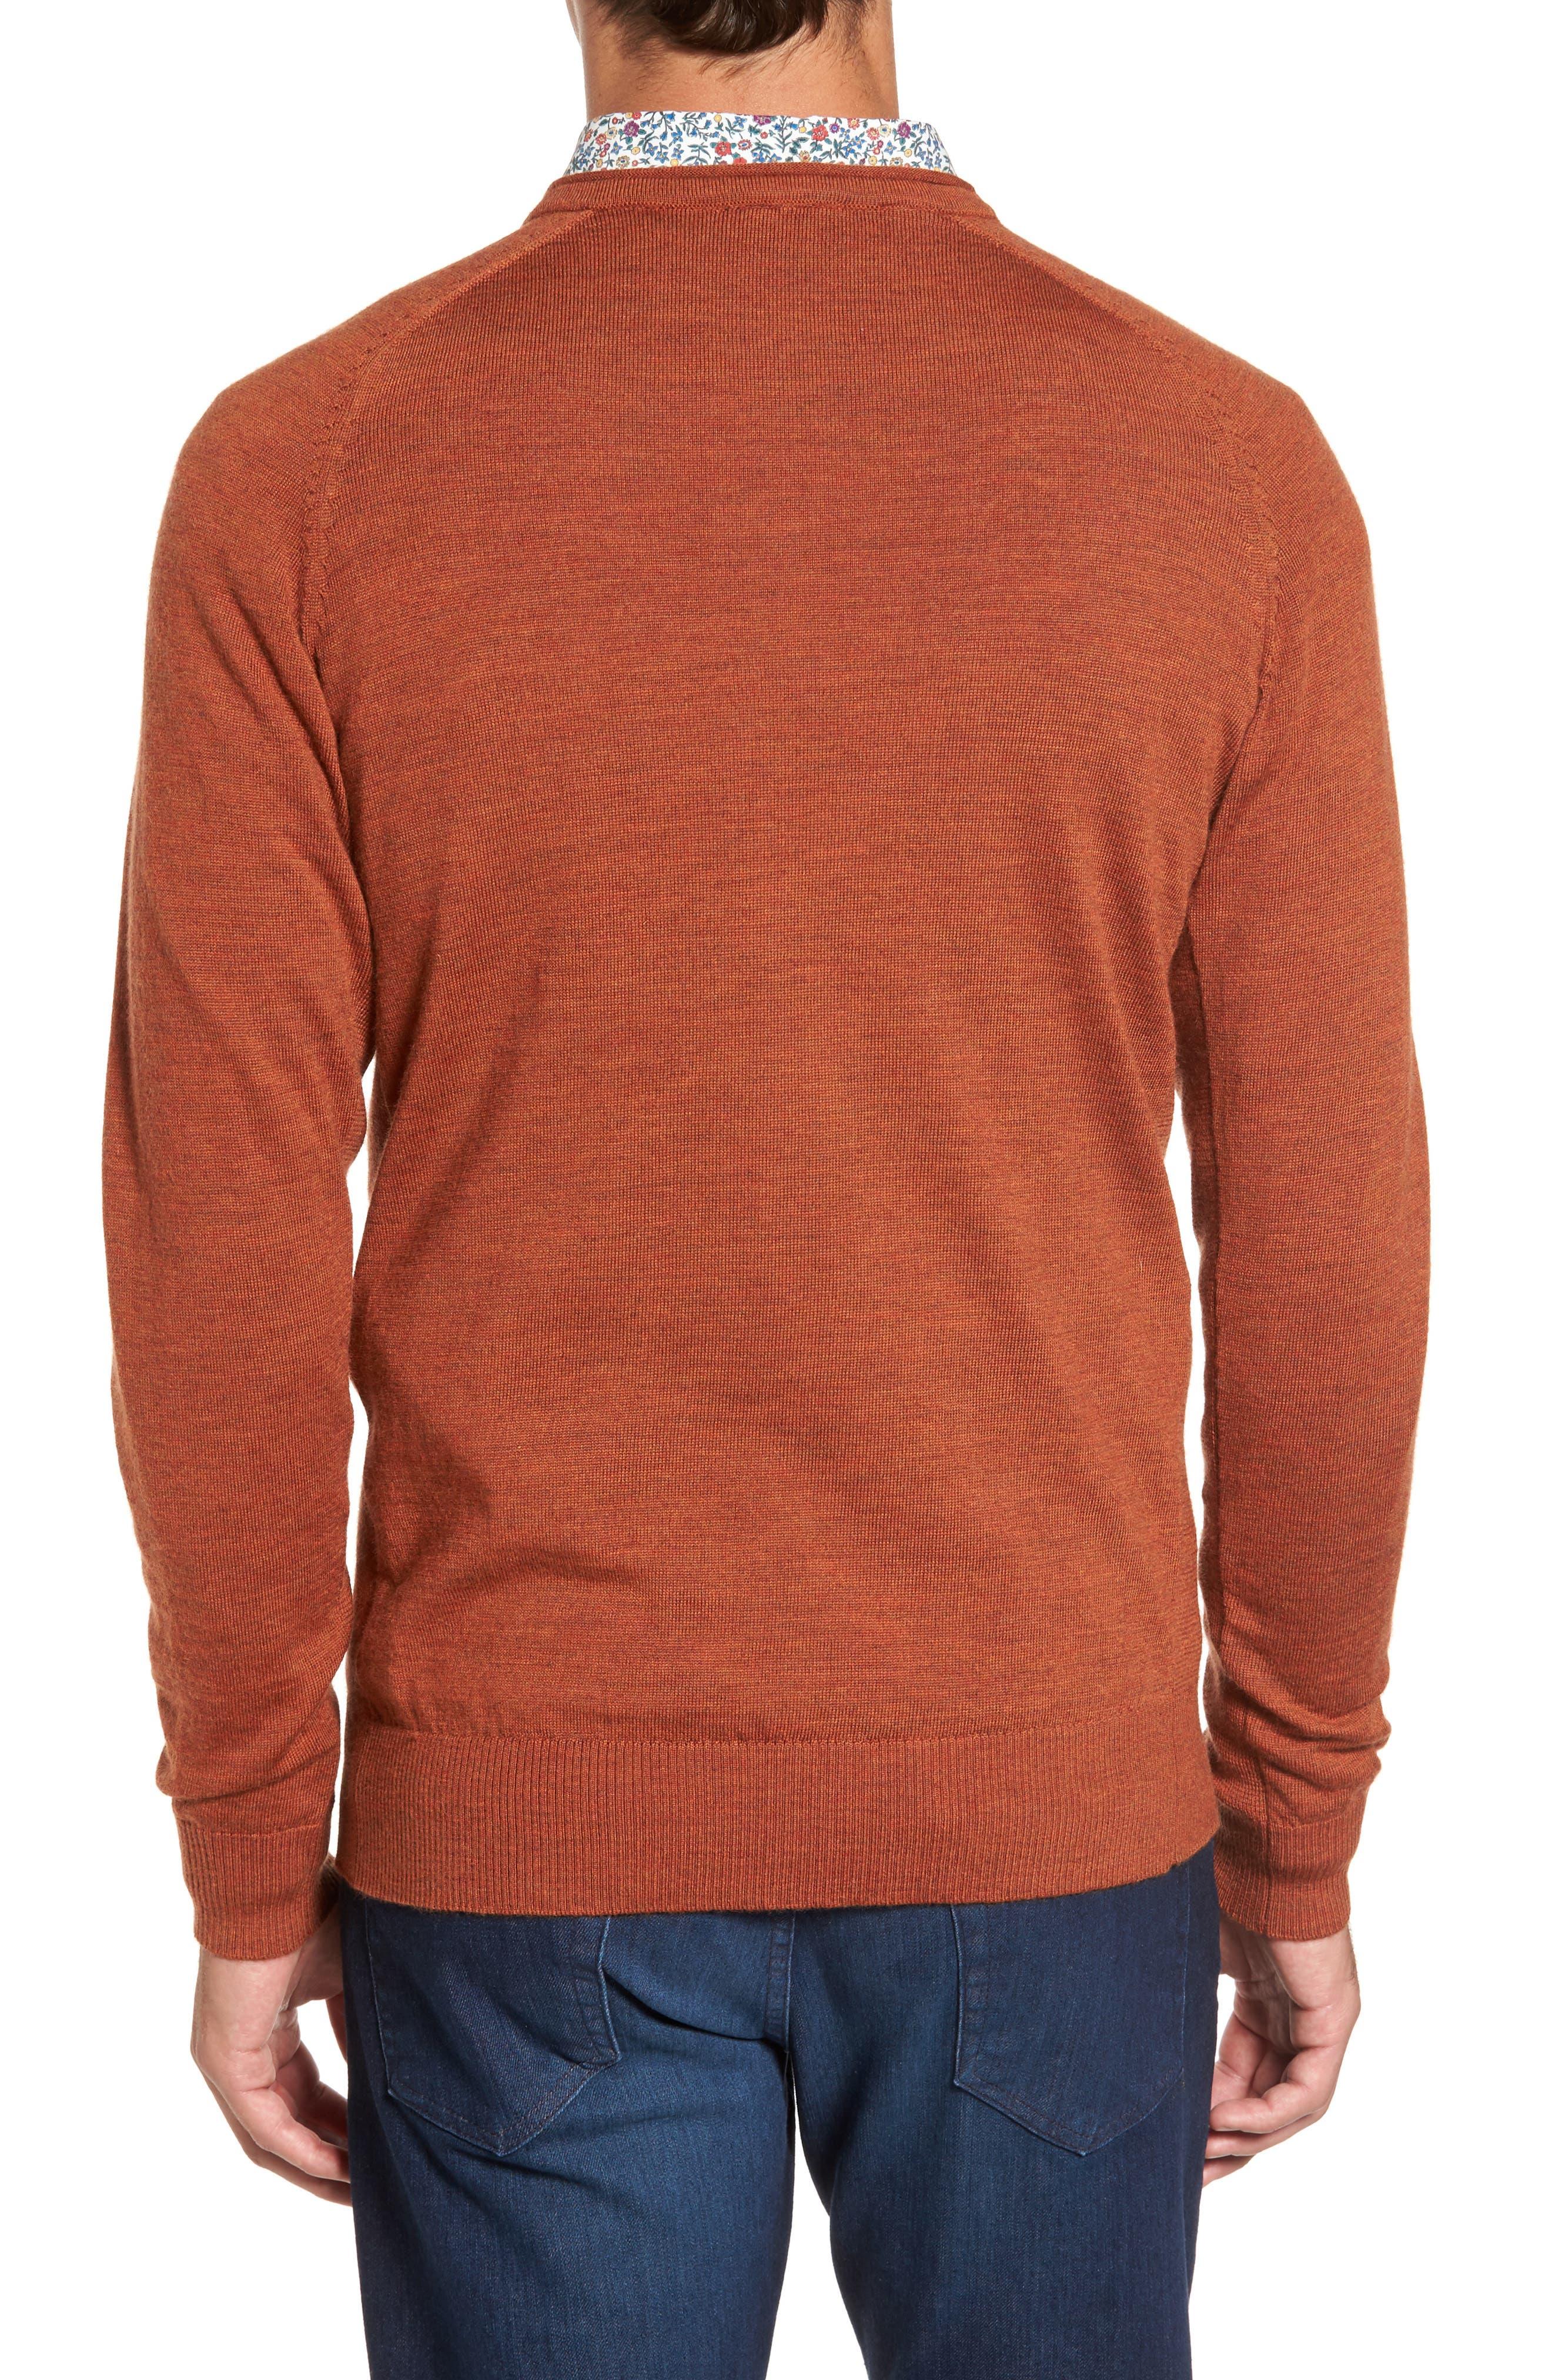 Burfield Wool Sweater,                             Alternate thumbnail 11, color,